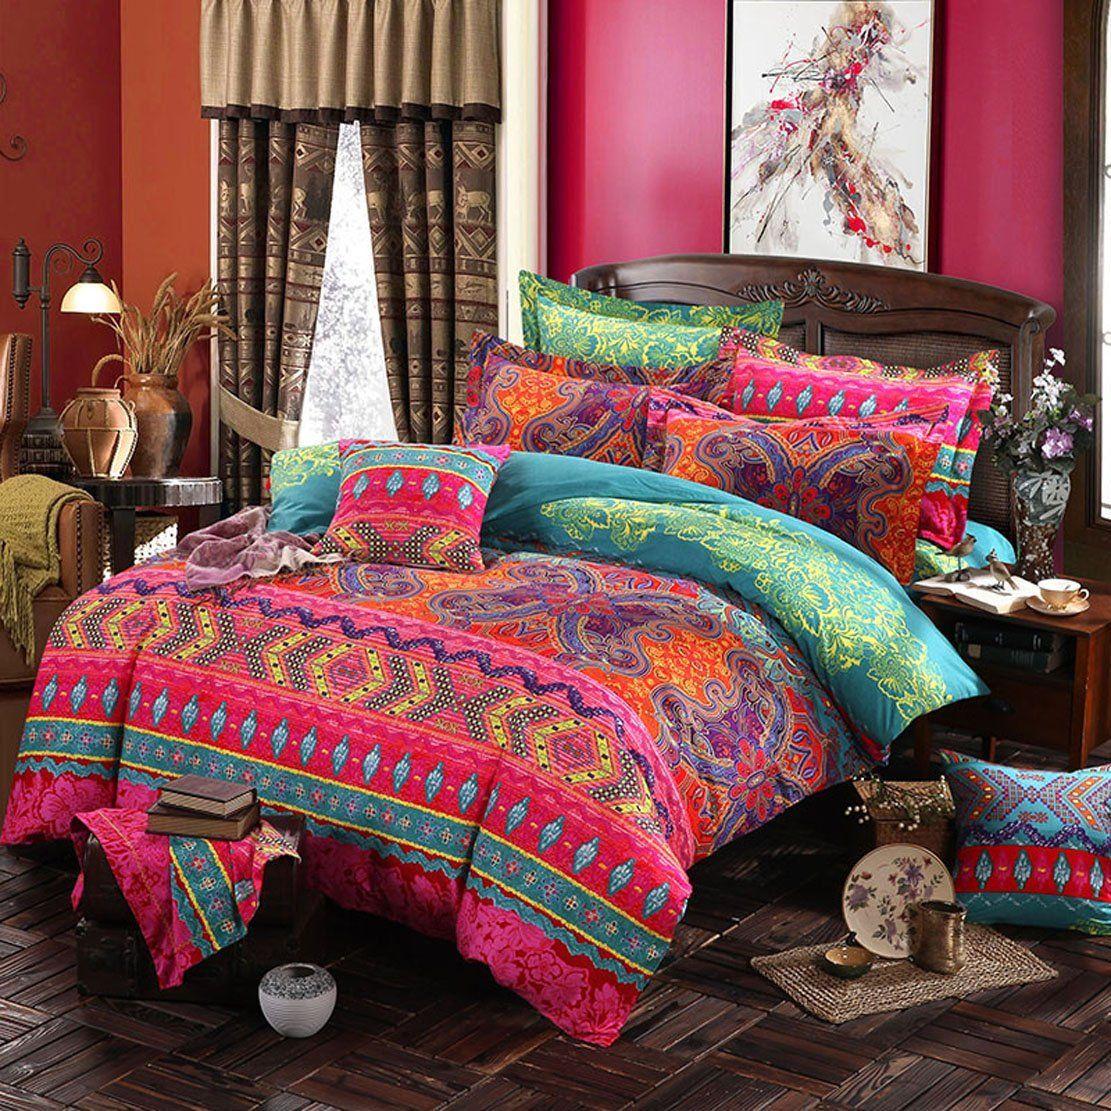 MAXYOYO New!Boho Style Duvet Cover Set,Colorful Stripe